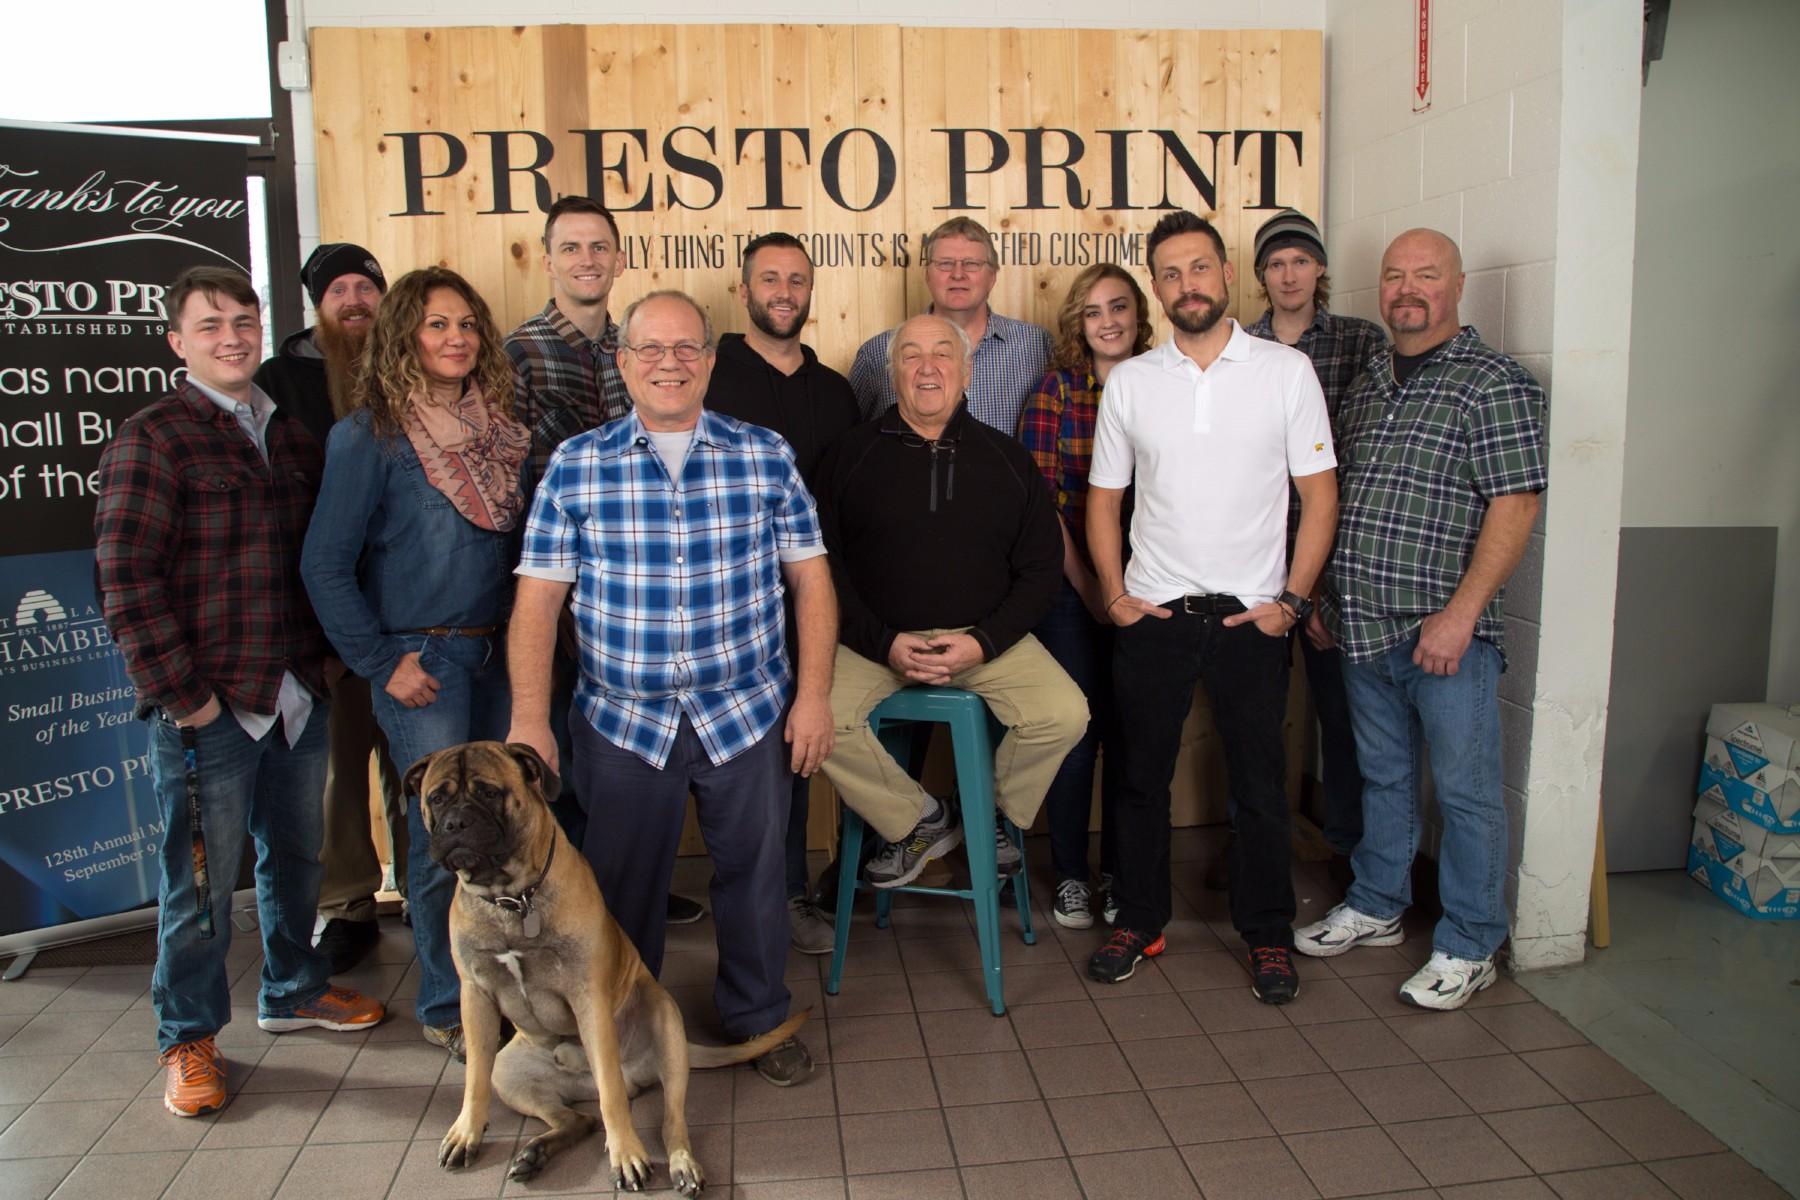 Presto print staff photo